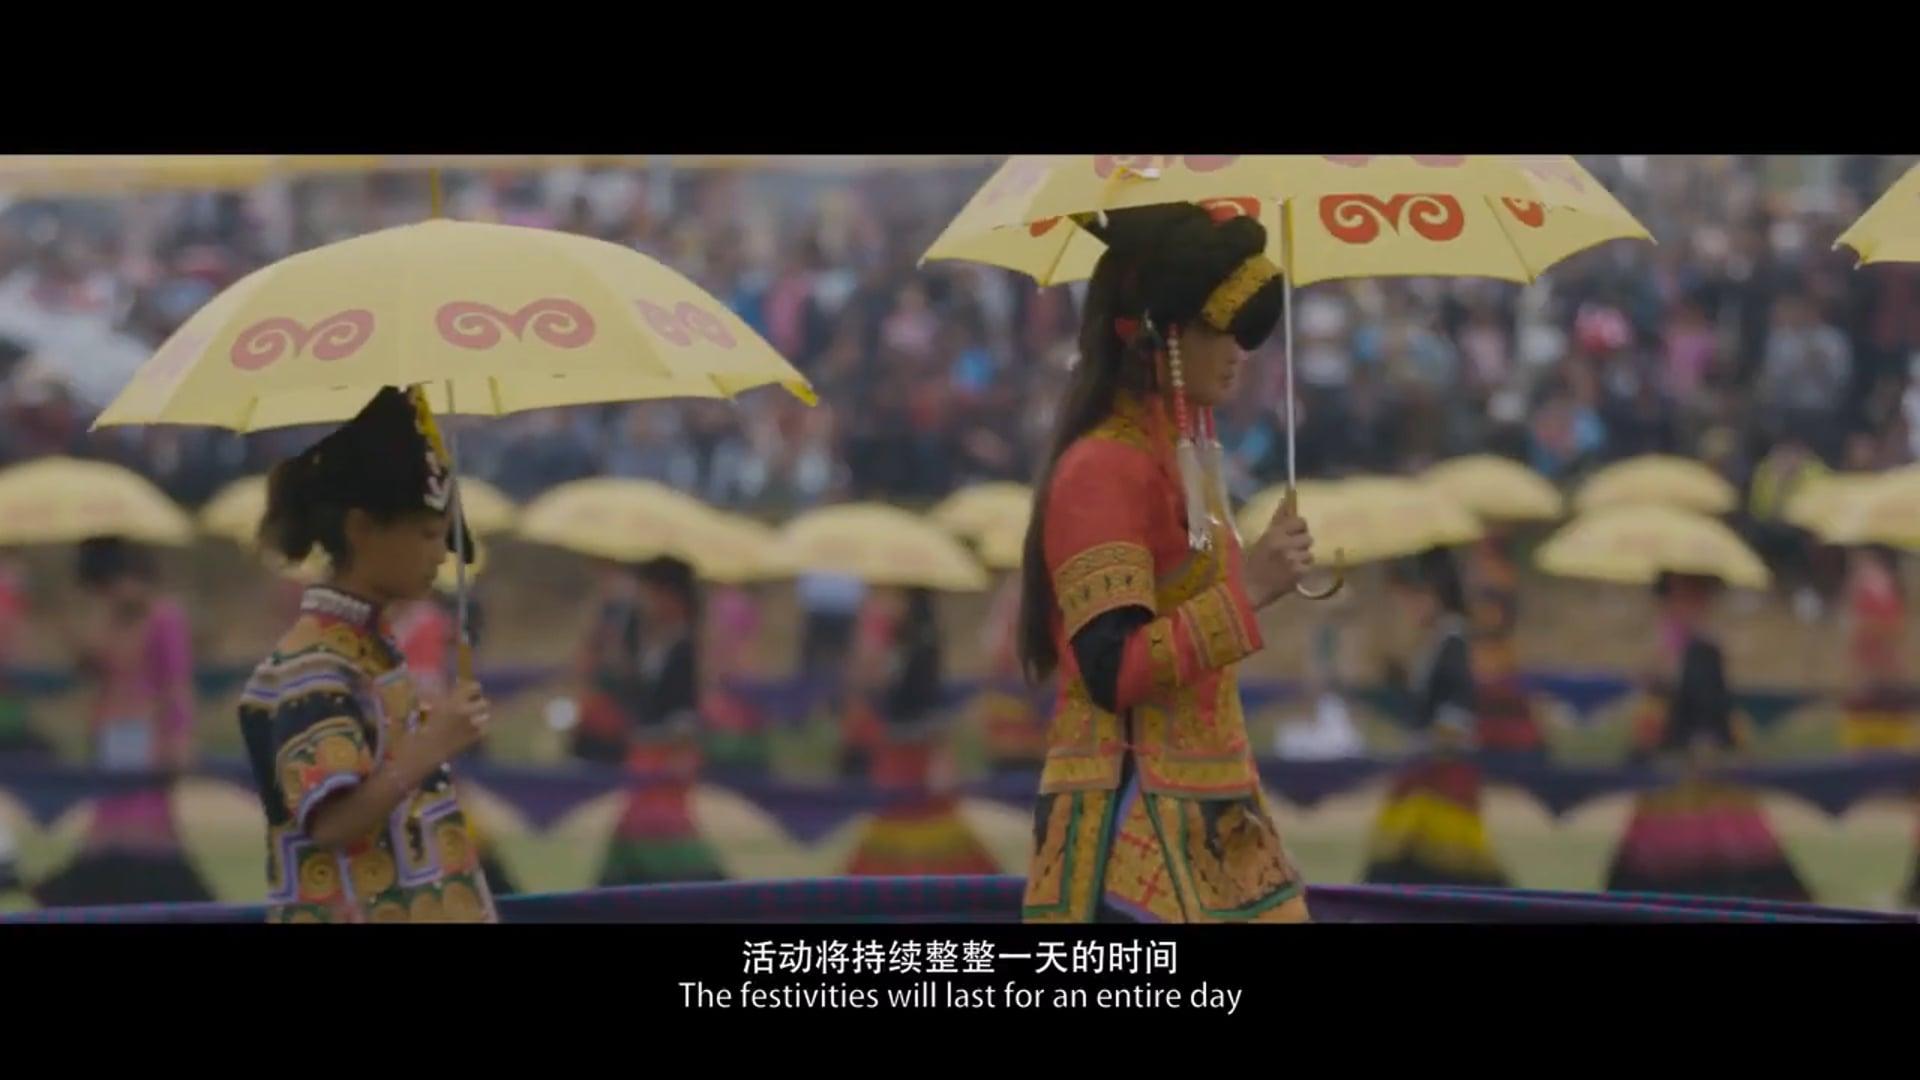 Beauty of China-Fire Revel